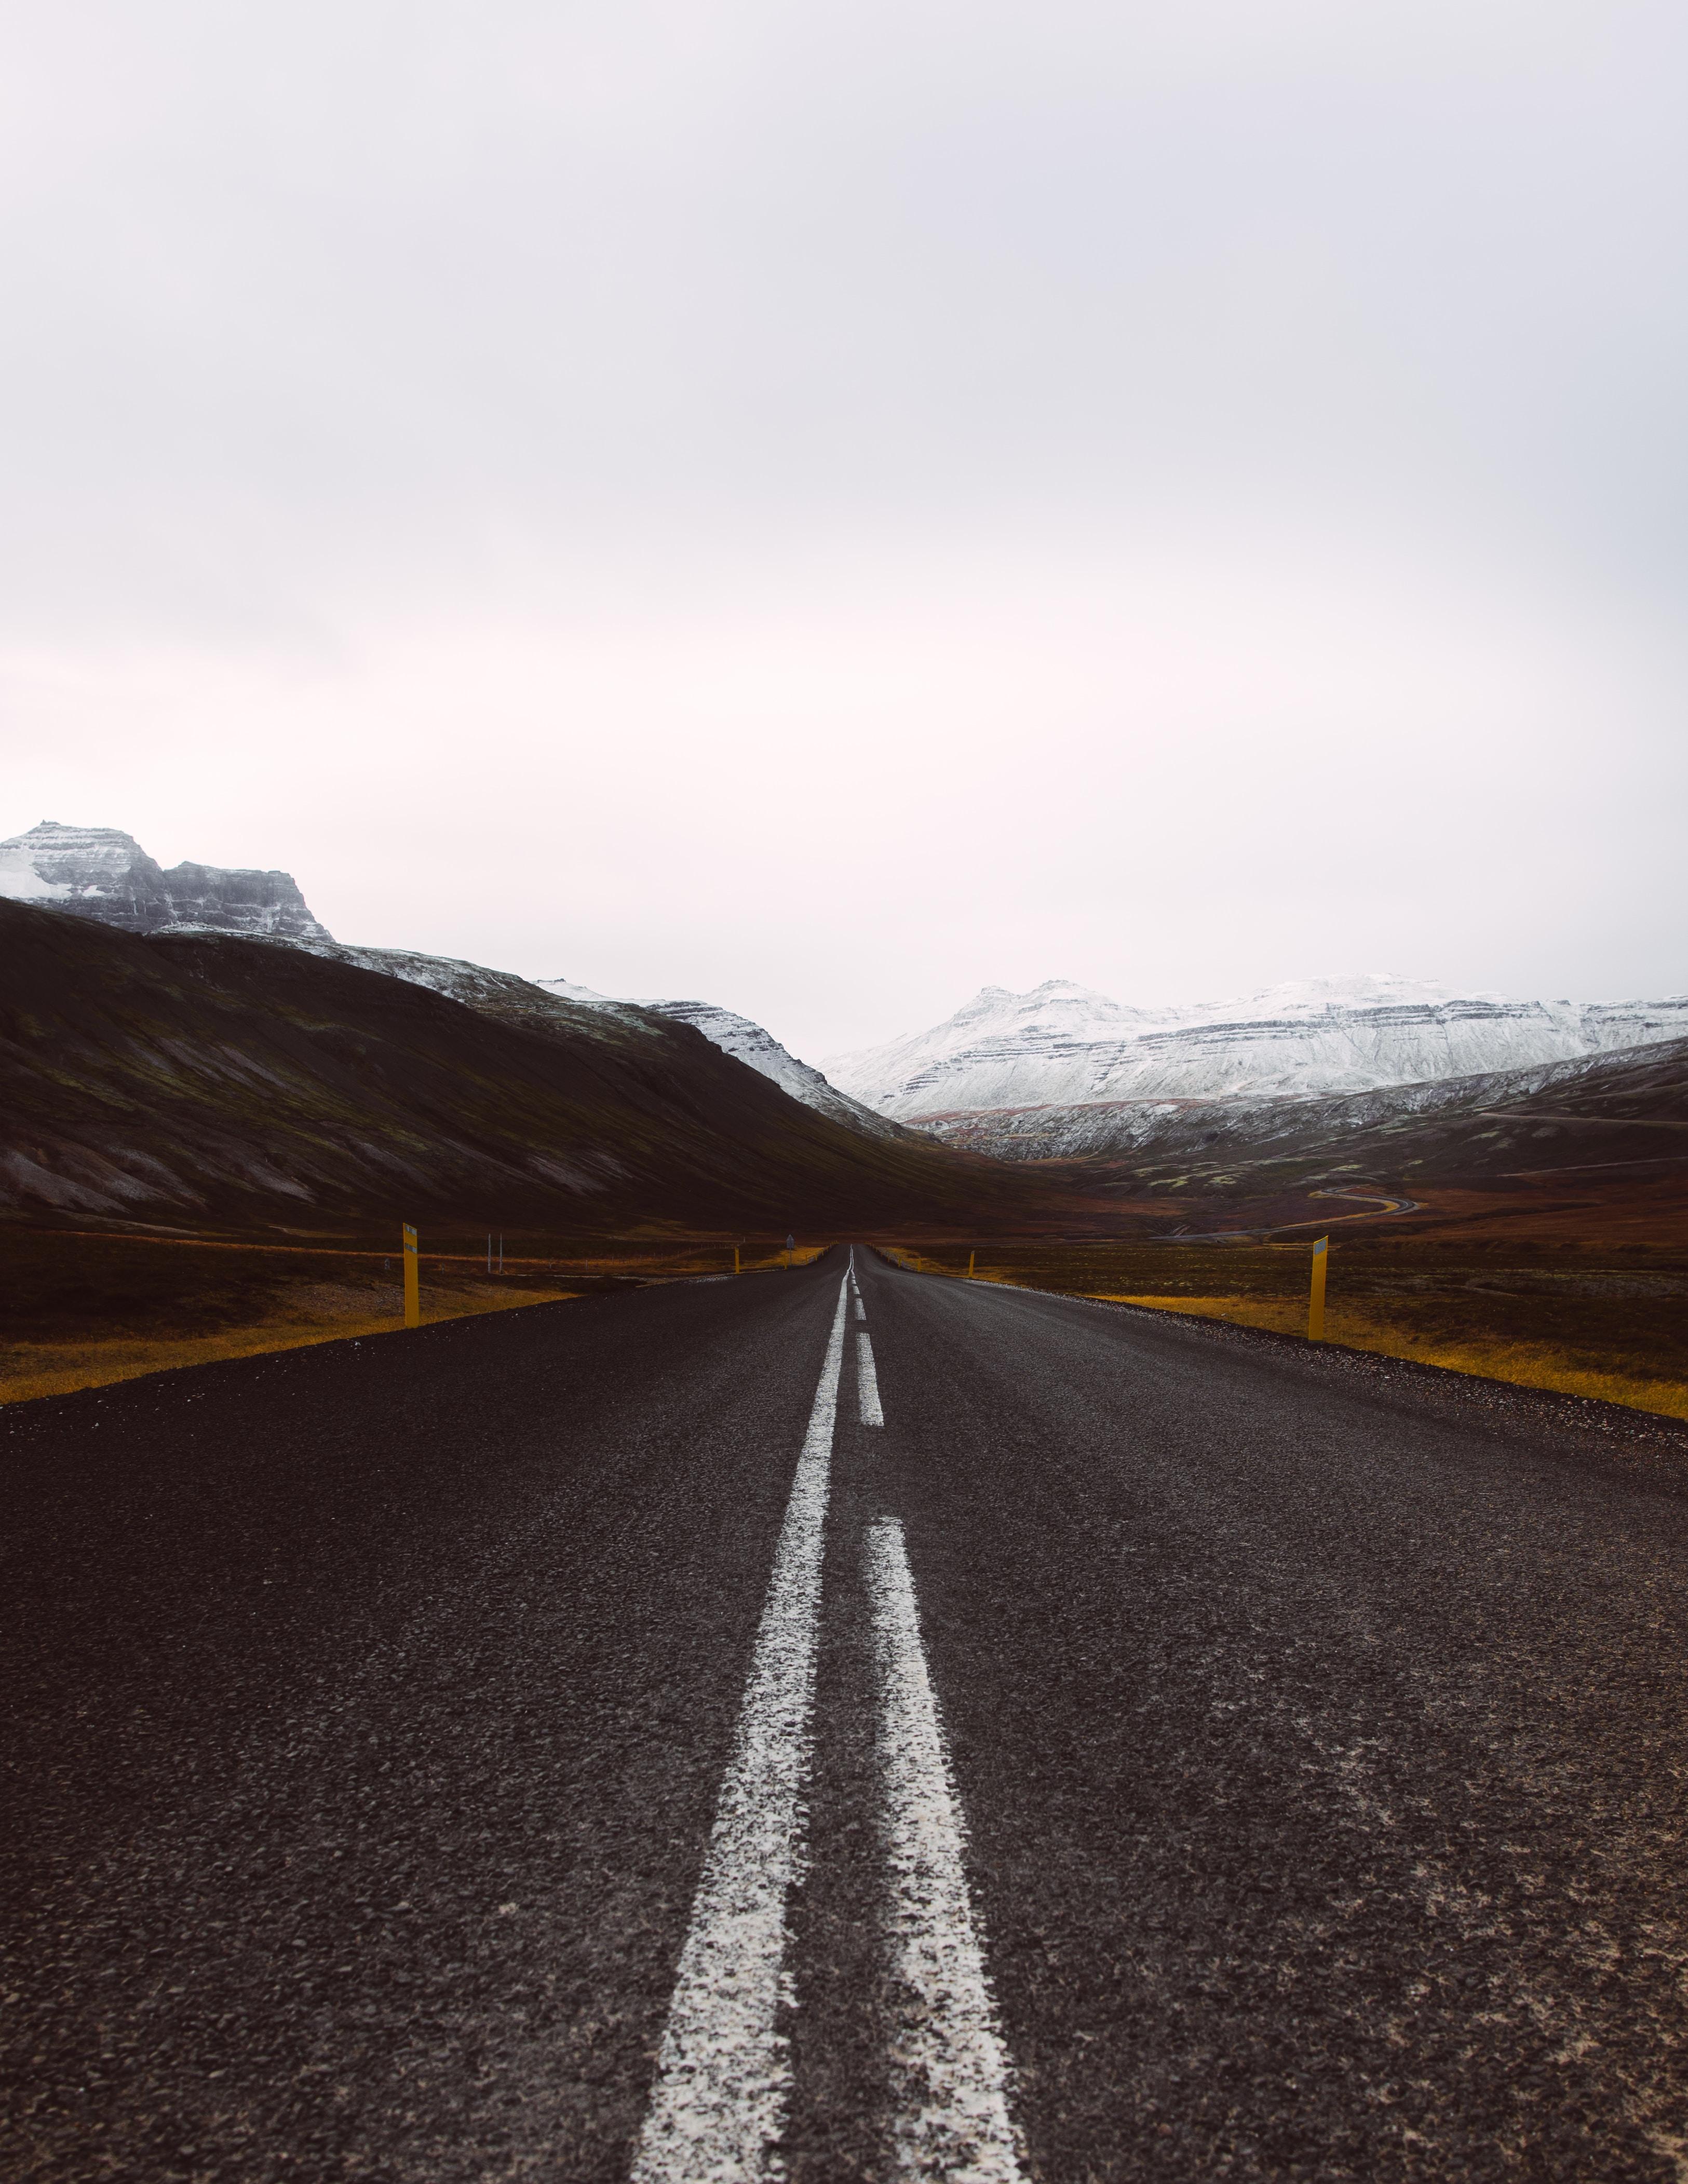 wallpaper Gray asphalt road under cloudy sky